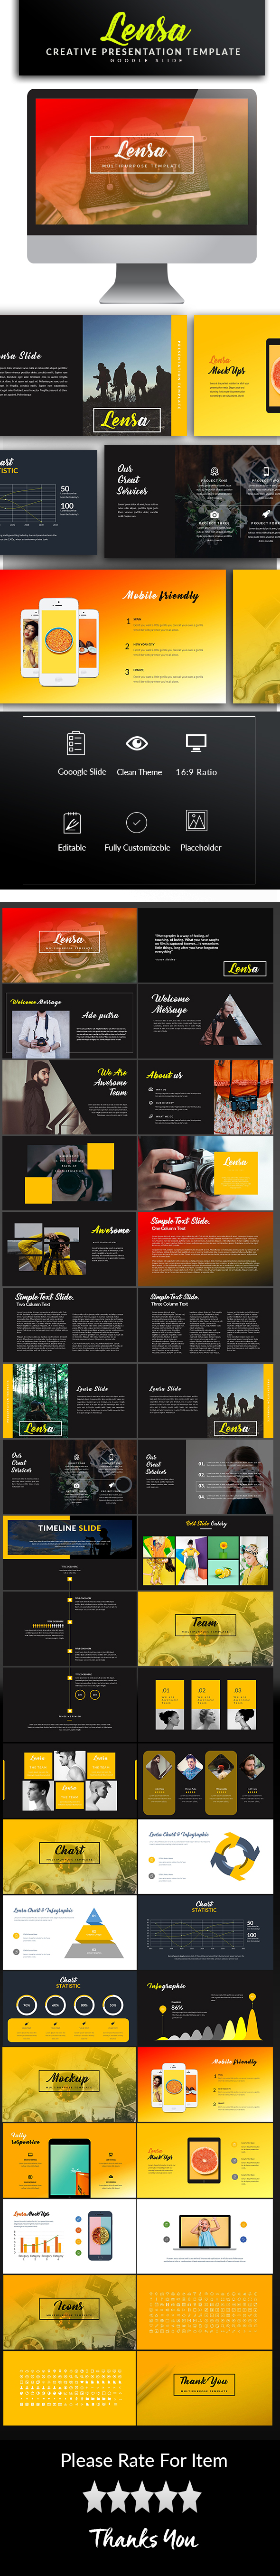 Lensa Google Slide Template - Google Slides Presentation Templates